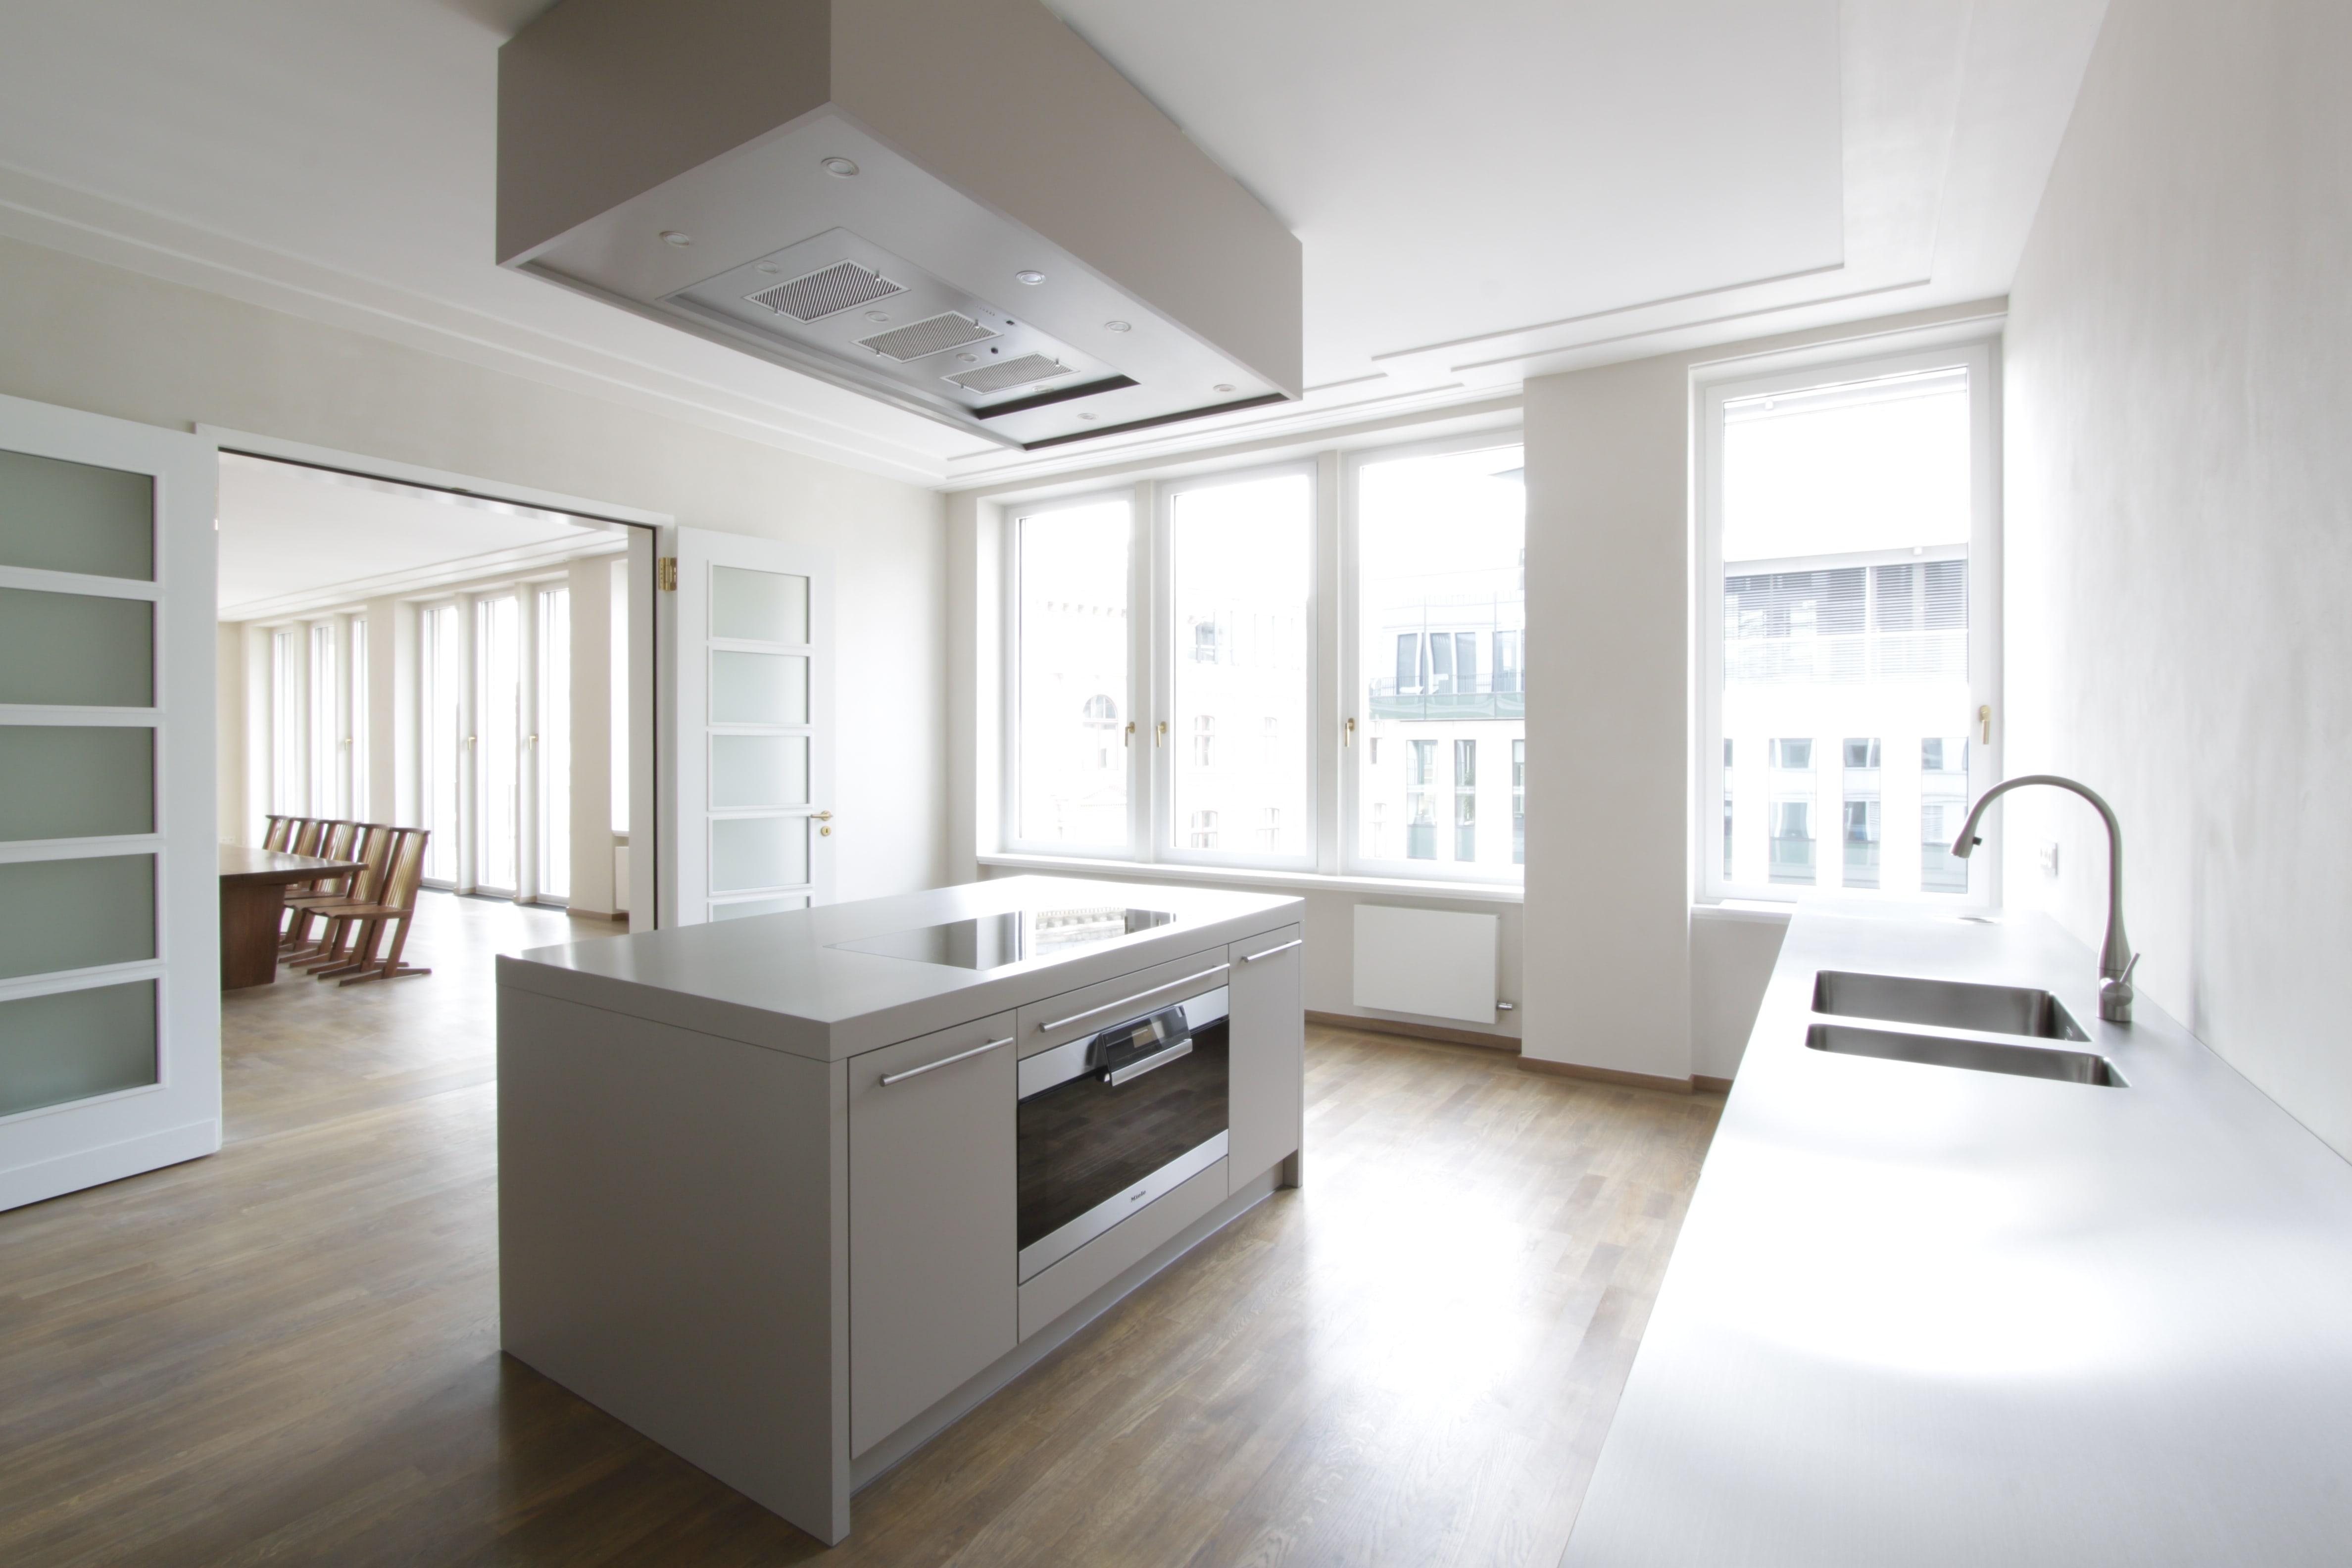 Interieur / Konzeption